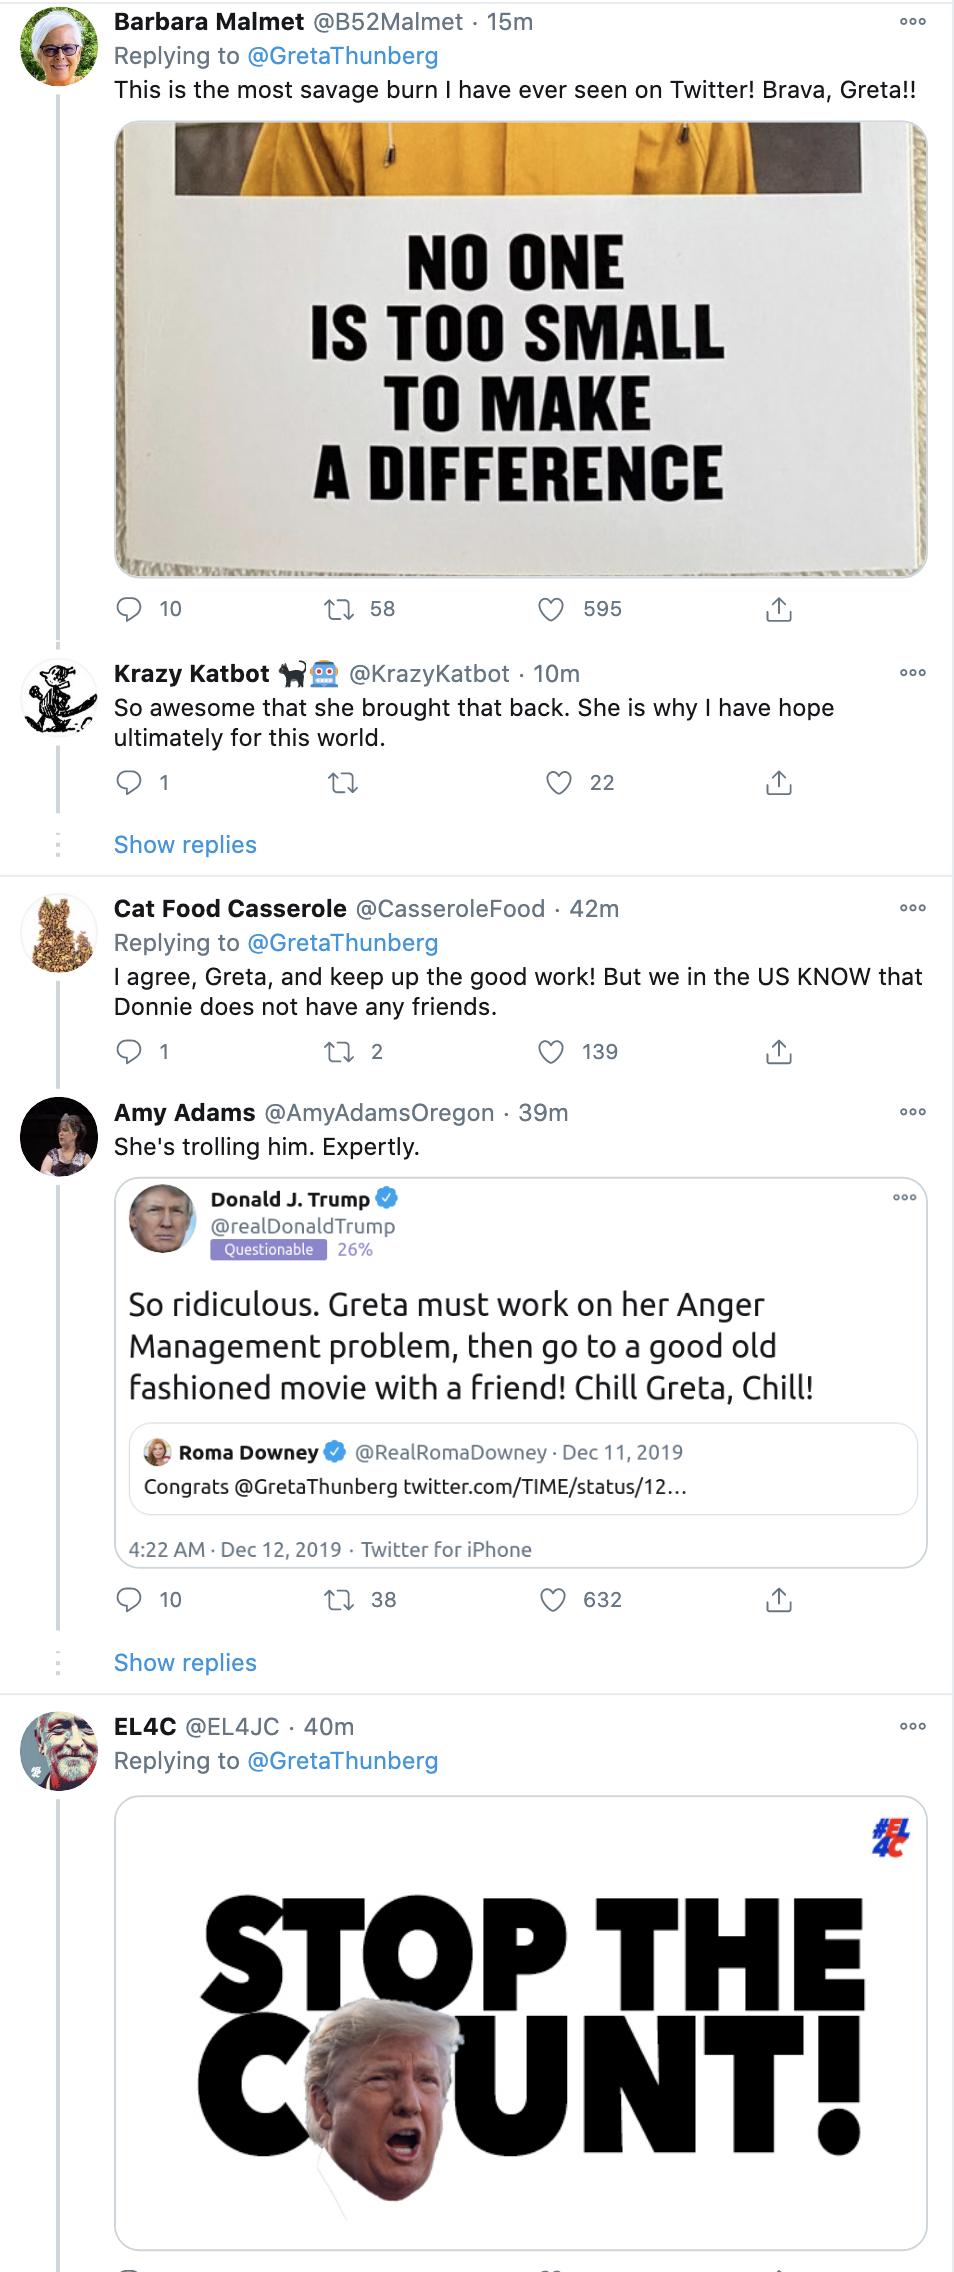 Screen-Shot-2020-11-05-at-2.38.39-PM Greta Thunberg Trolls Trump Like A Boss: 'Chill Donald, Chill' Activism Environment Featured Politics Top Stories